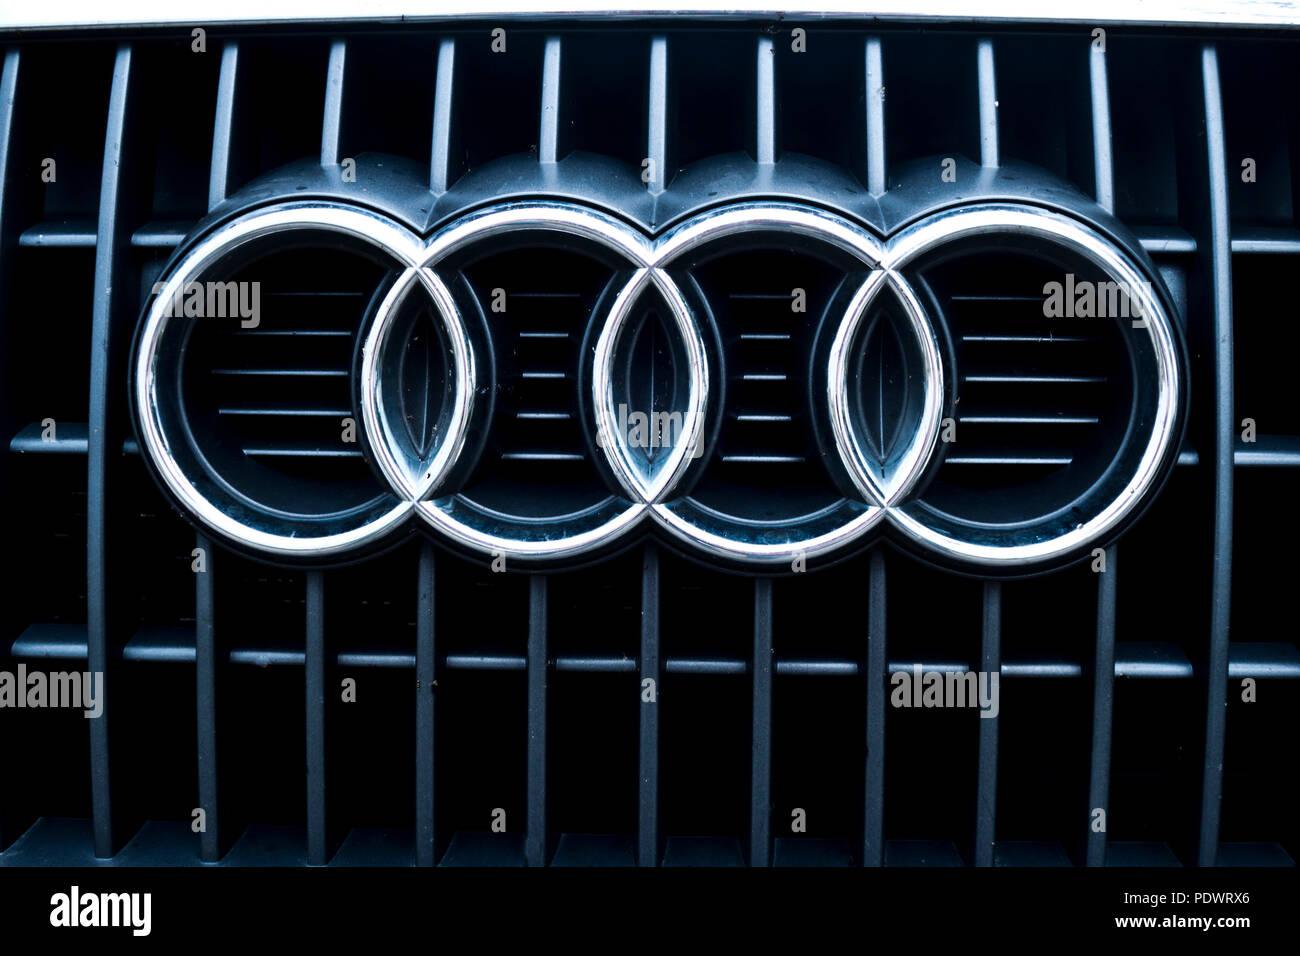 Logo Of Luxury Car Manufacturer Audi Stock Photo 215082510 Alamy